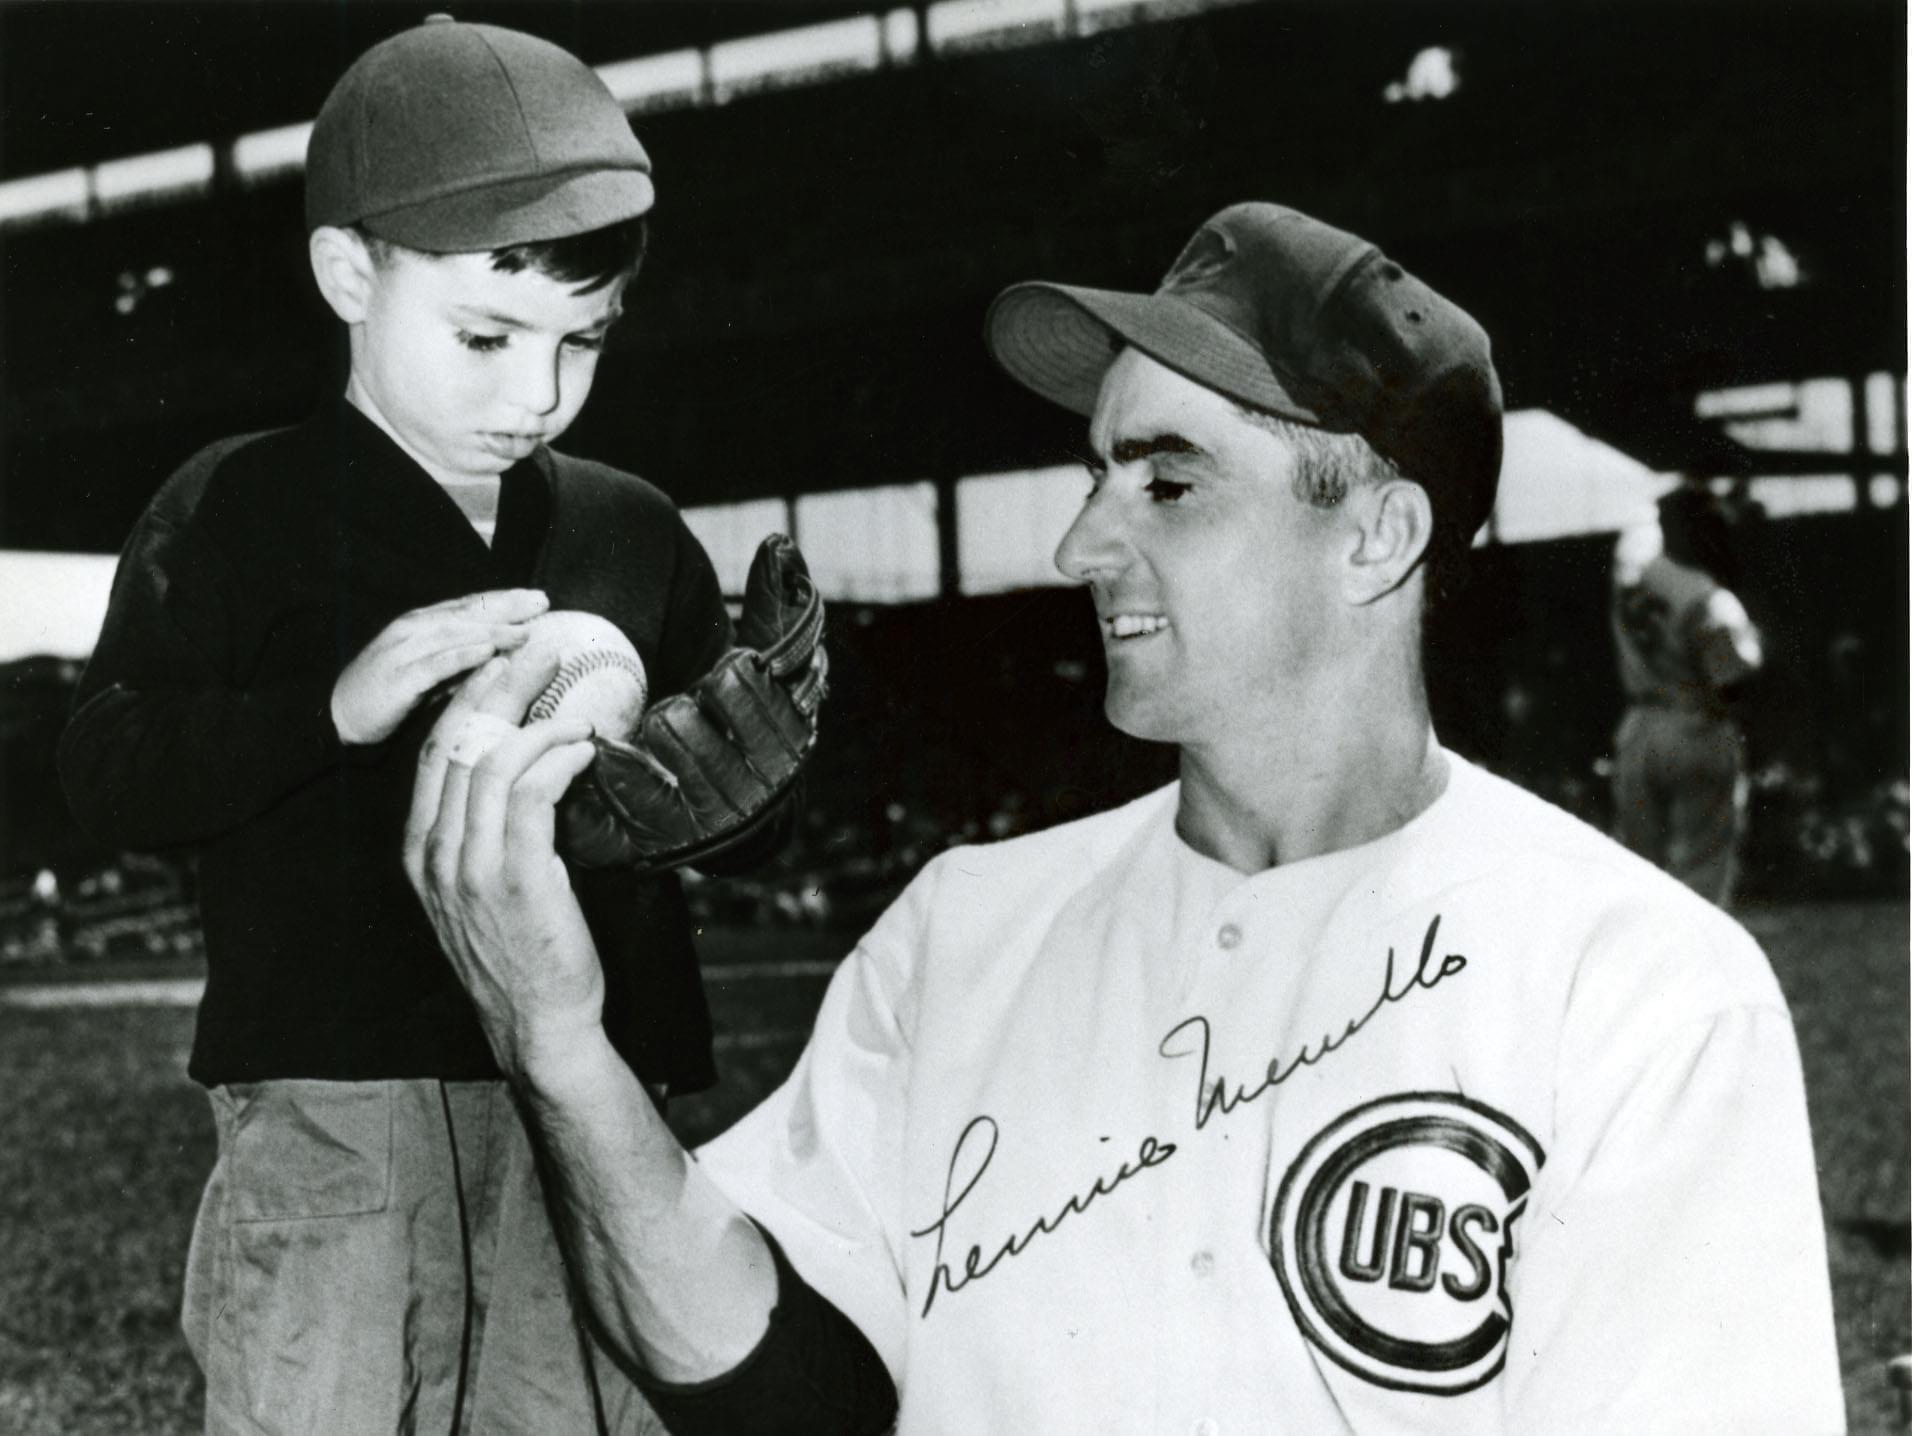 Lennie Merullo and his son, Len 'Boots' Merullo at Wrigley Field.